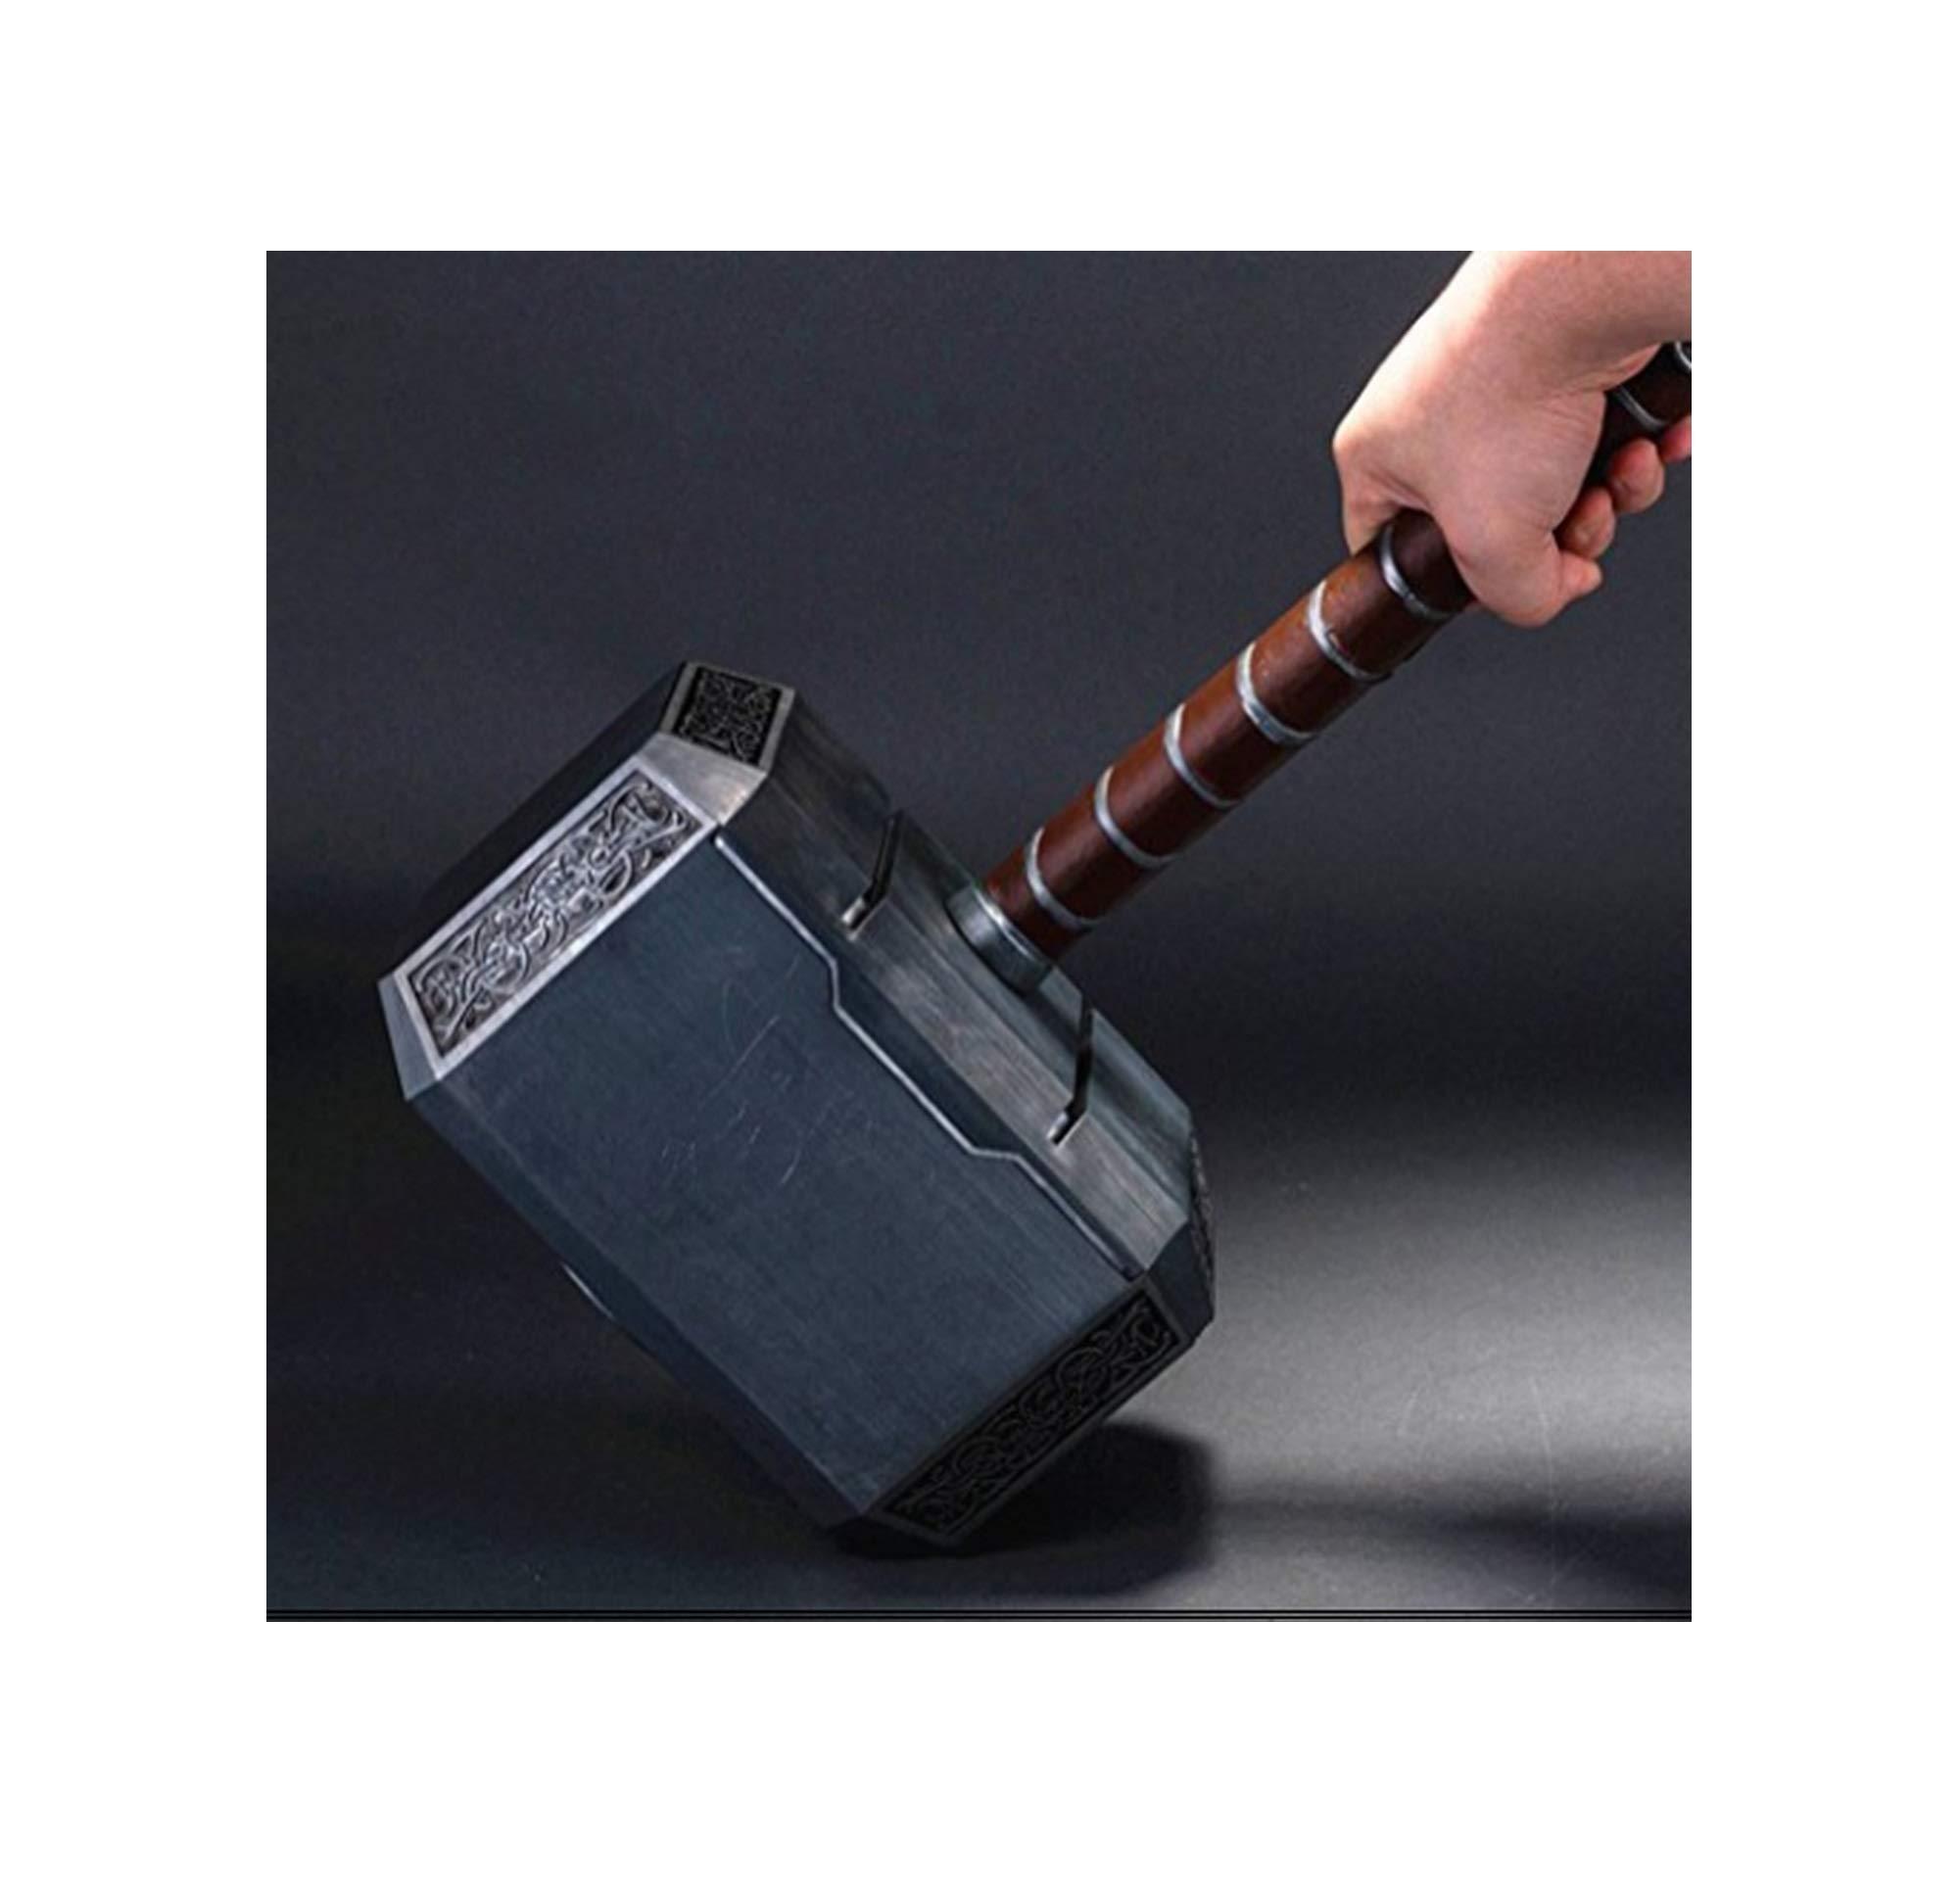 1:1 Full Solid Avengers Thor Hammer Replica Prop Resin Mjolnir Cosplay